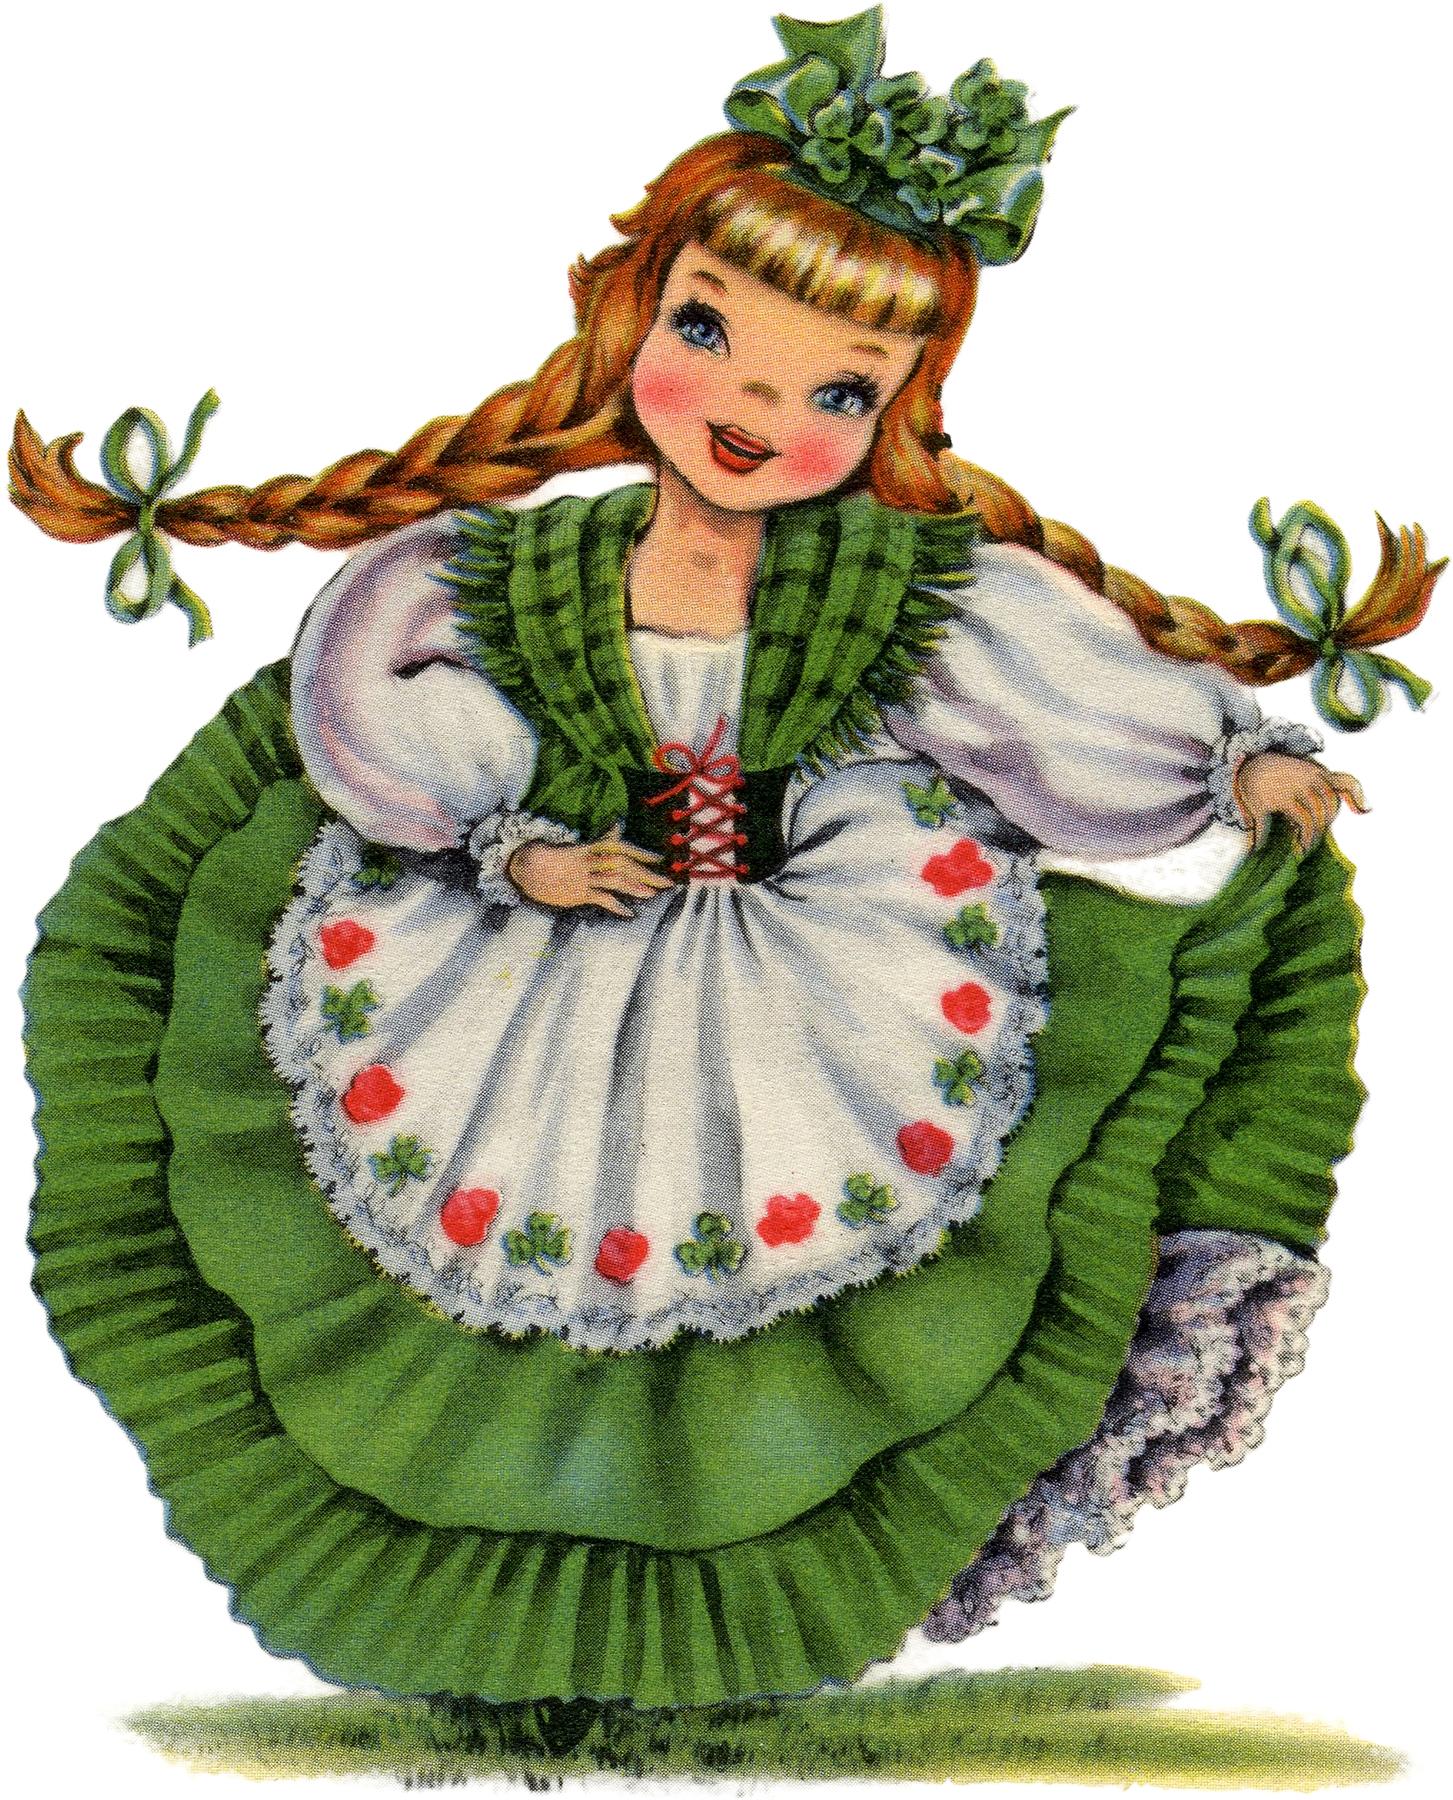 patrick s children. Fairy clipart st patrick's day